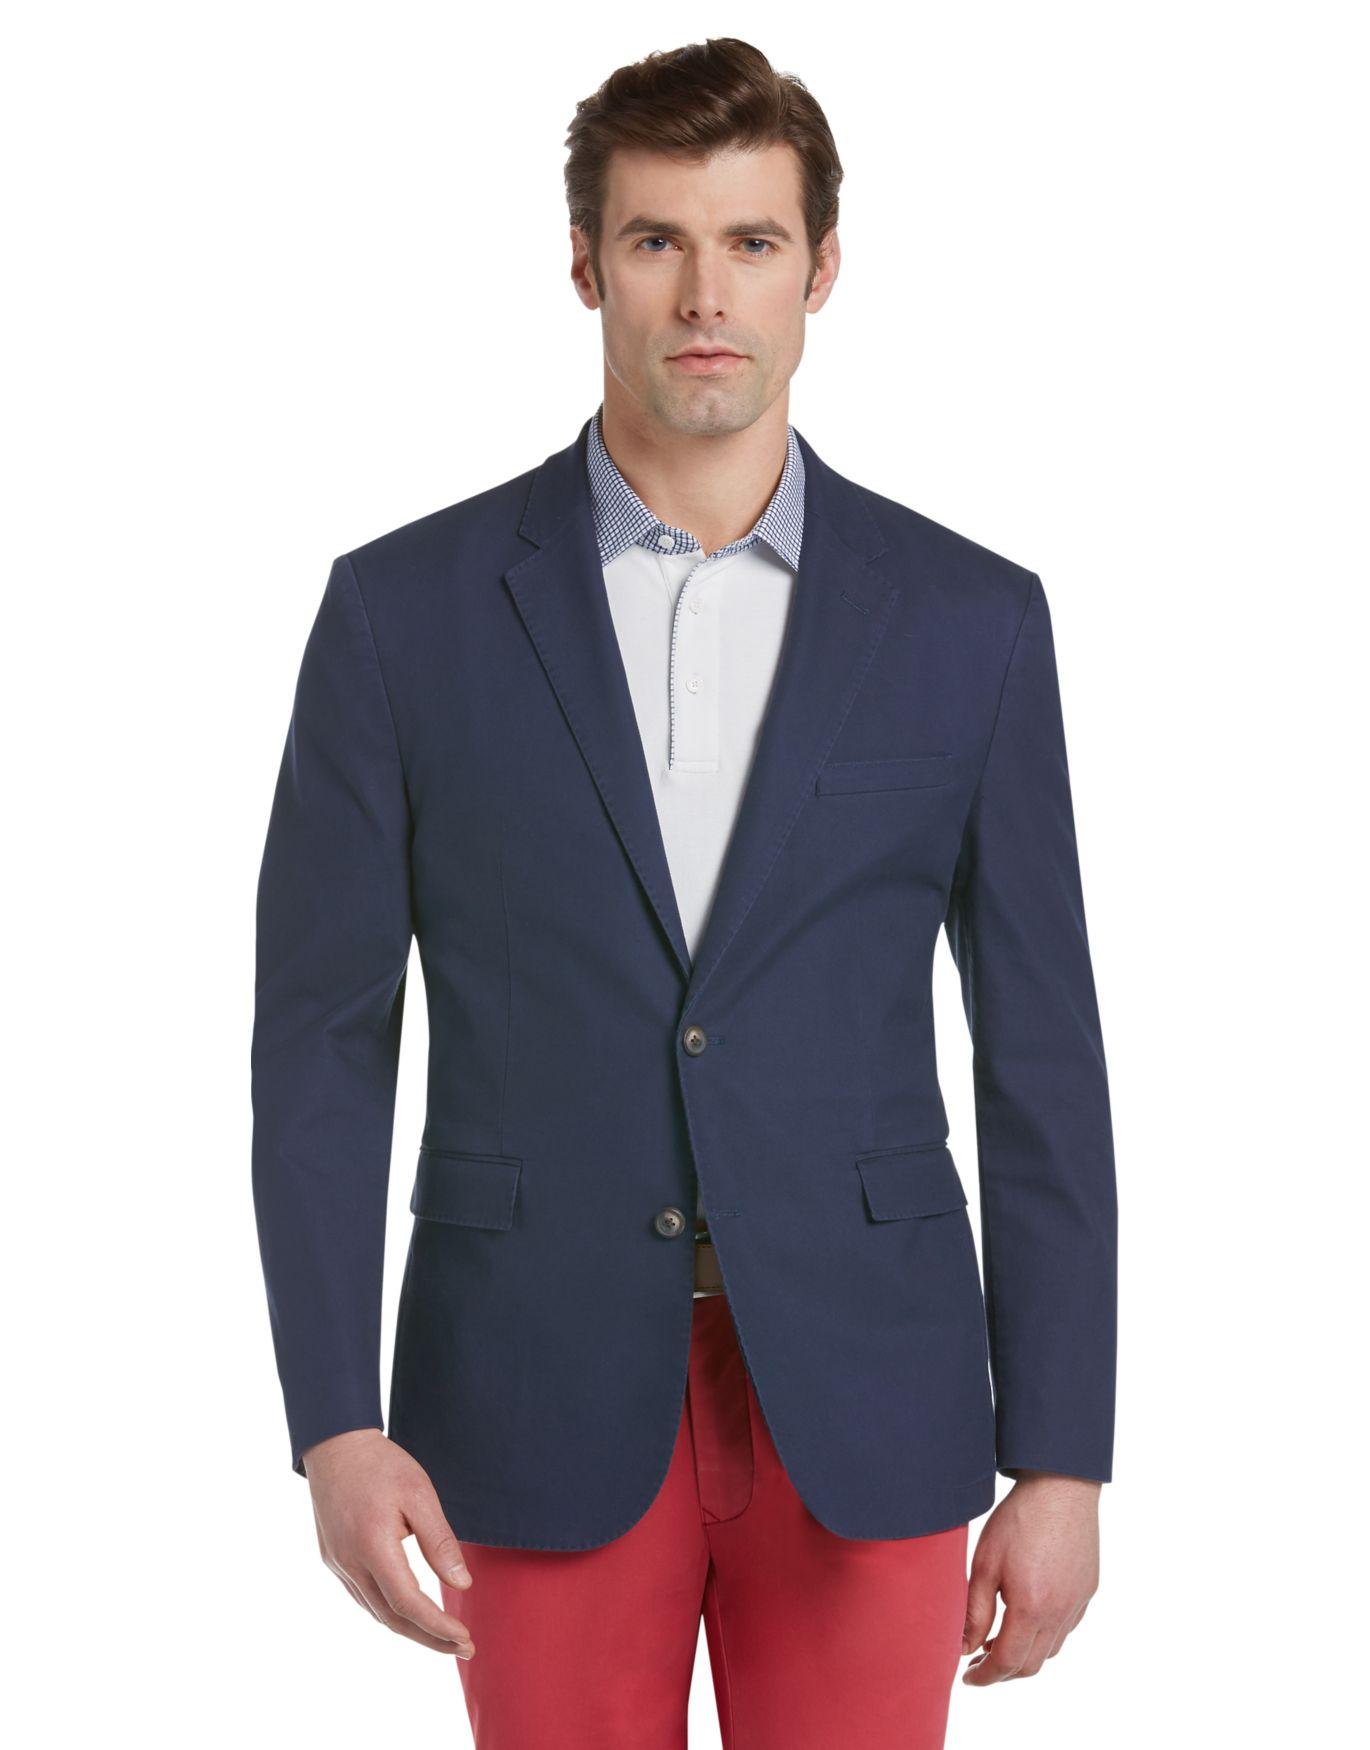 All Sportcoats & Blazers | Men's SportCoats | JoS. A. Bank Clothiers